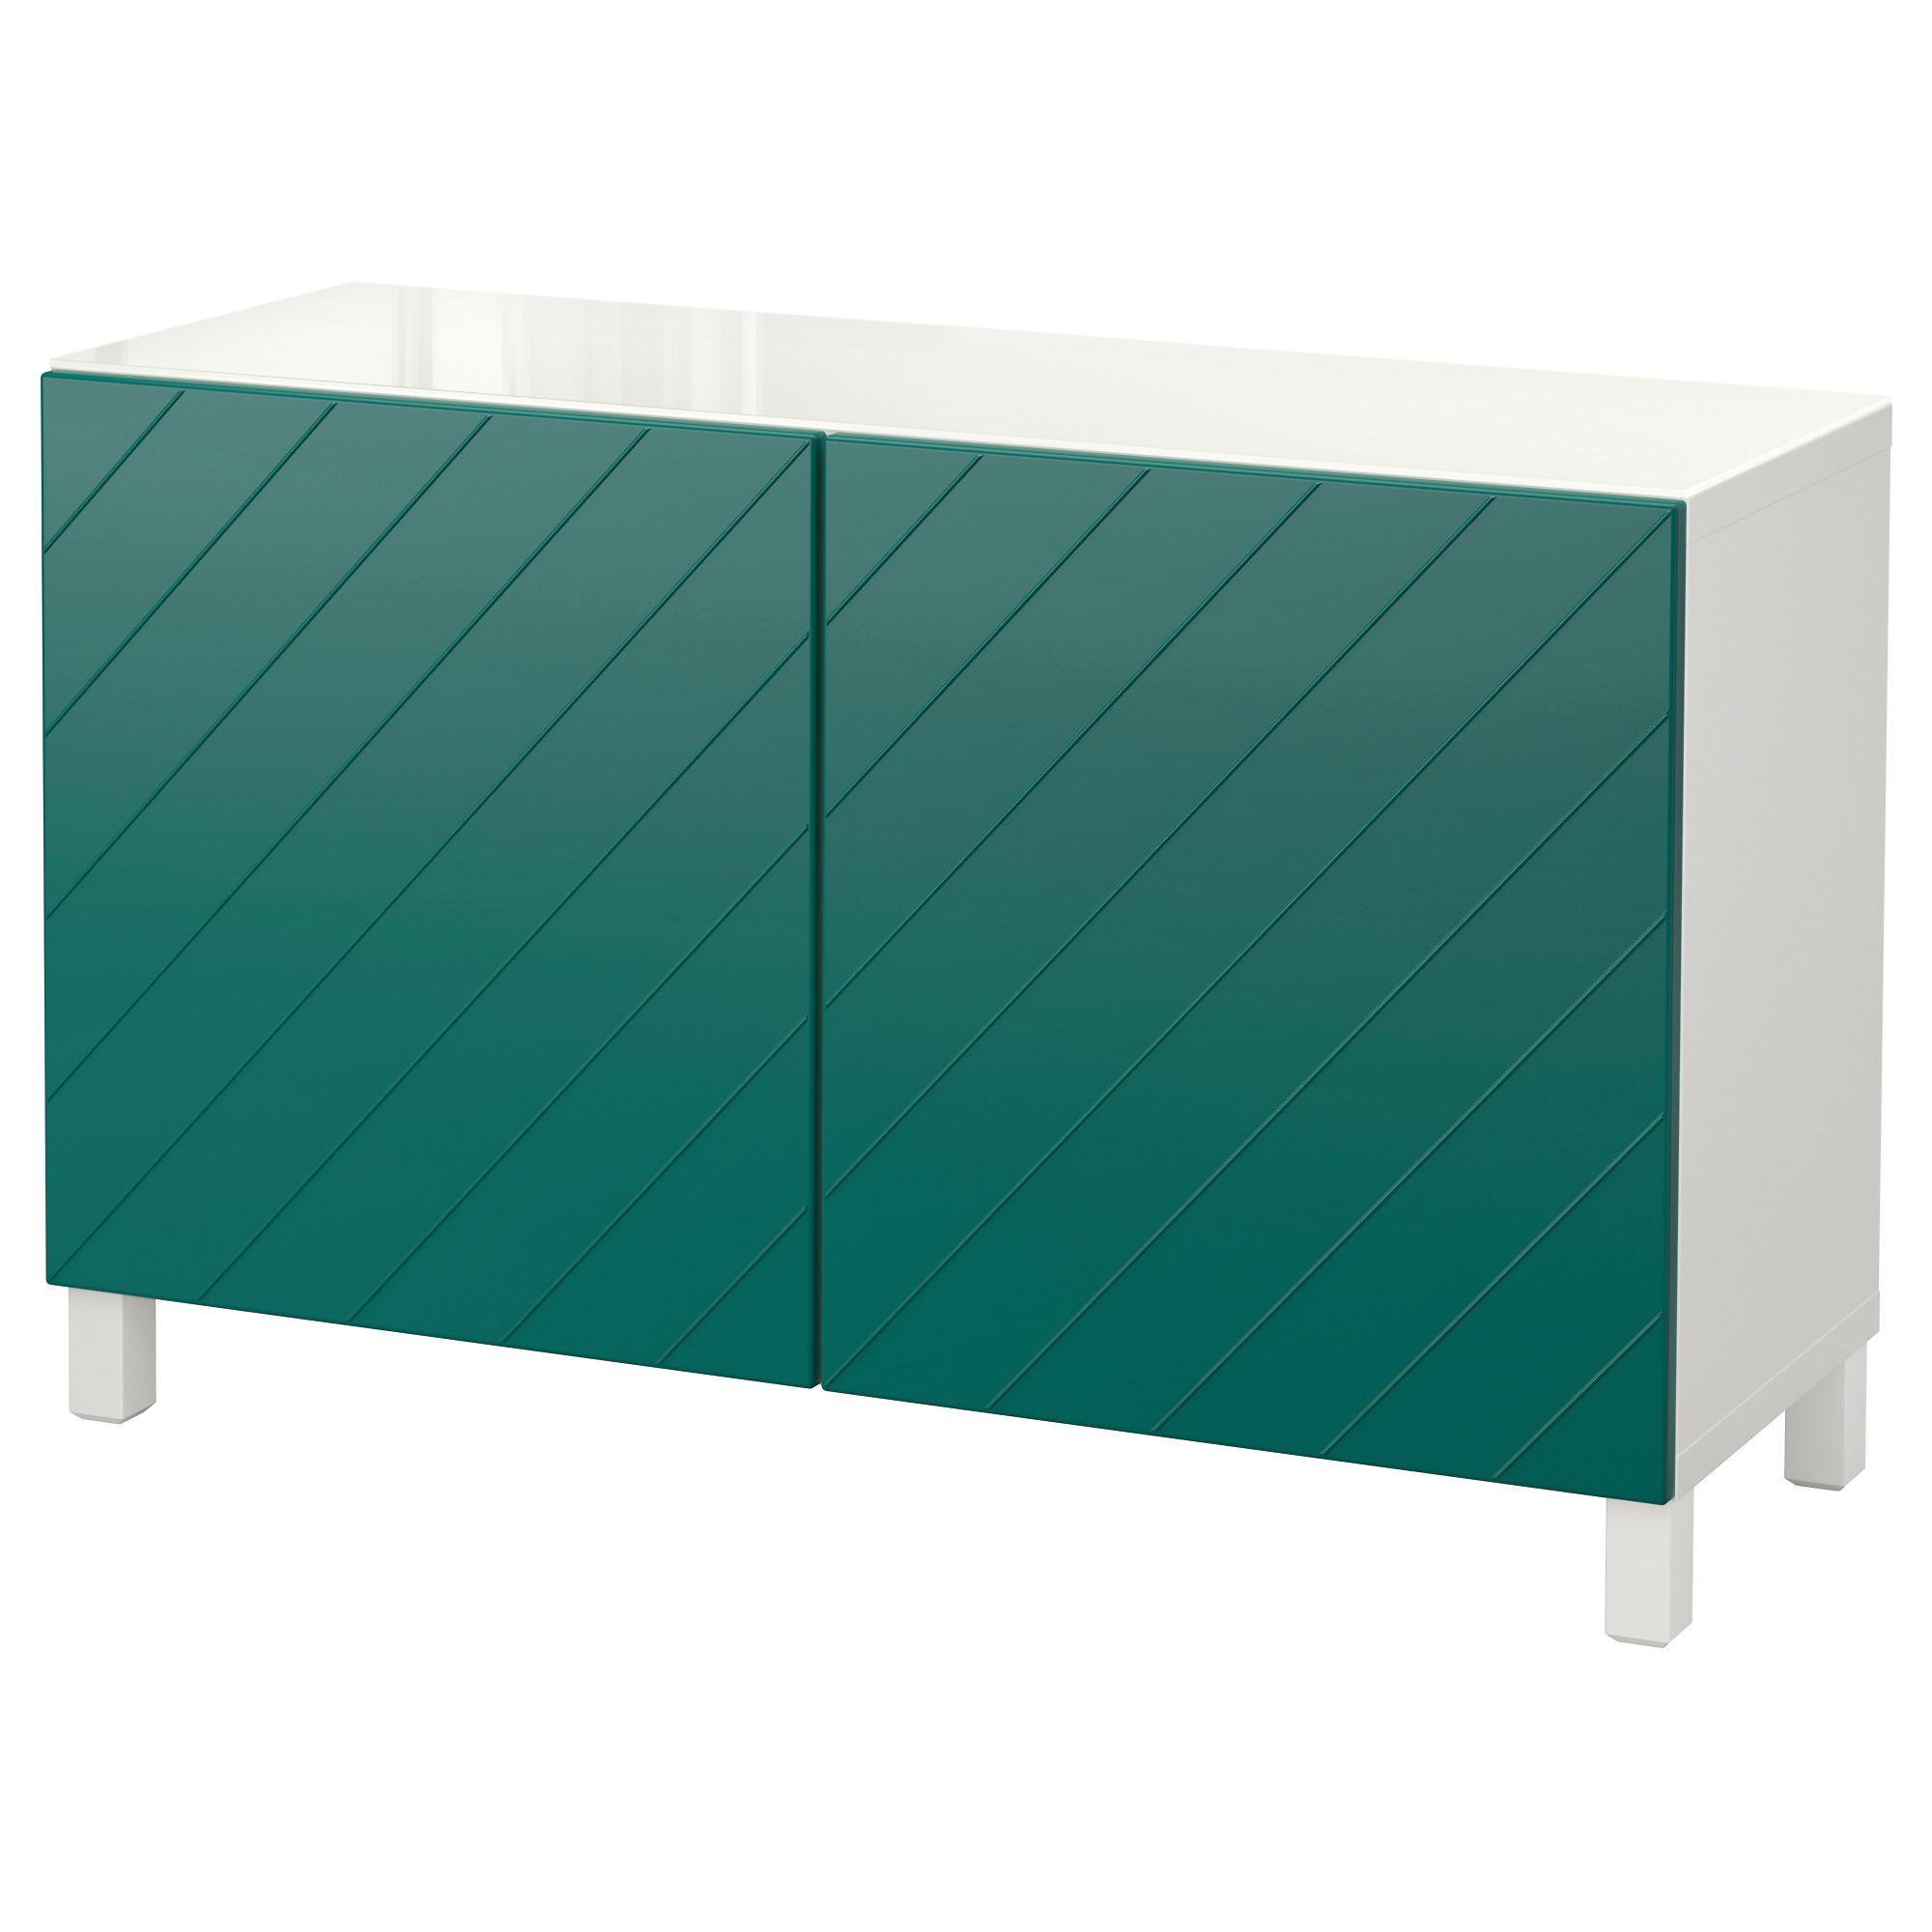 Комбинация для хранения с дверцами БЕСТО сине-зеленый артикуль № 492.760.78 в наличии. Онлайн магазин IKEA РБ. Недорогая доставка и монтаж.